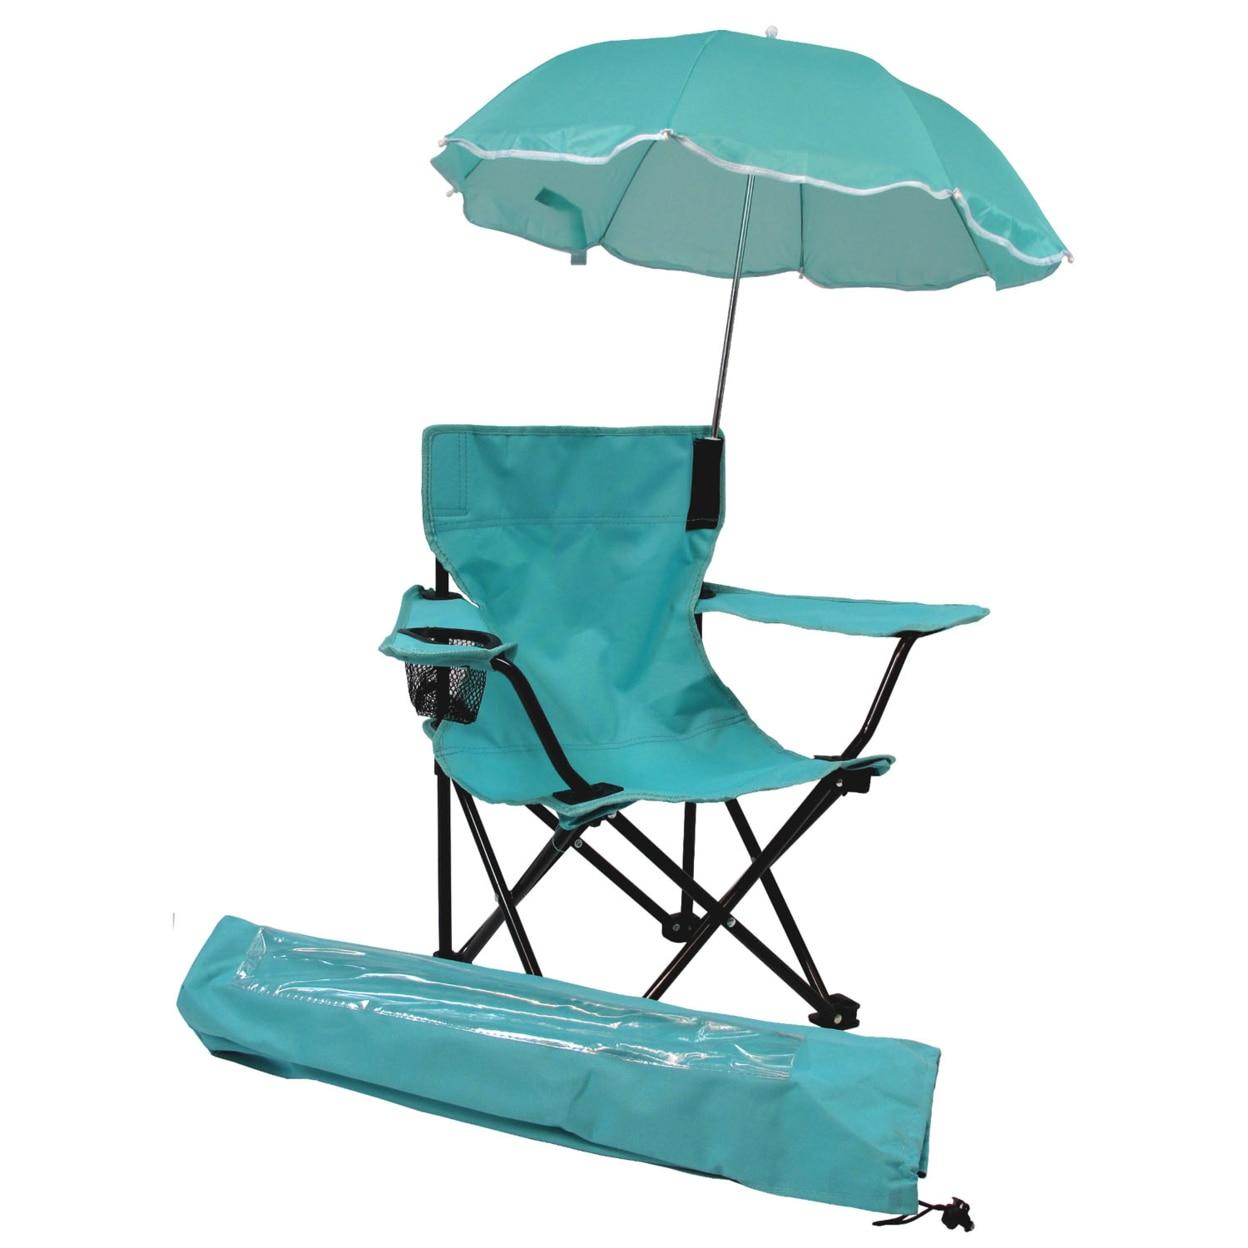 Redmon Home Beach Baby All-Season Umbrella Chair with Matching Shoulder Bag пена бытовая mastertex all season 300 мл всесезонная